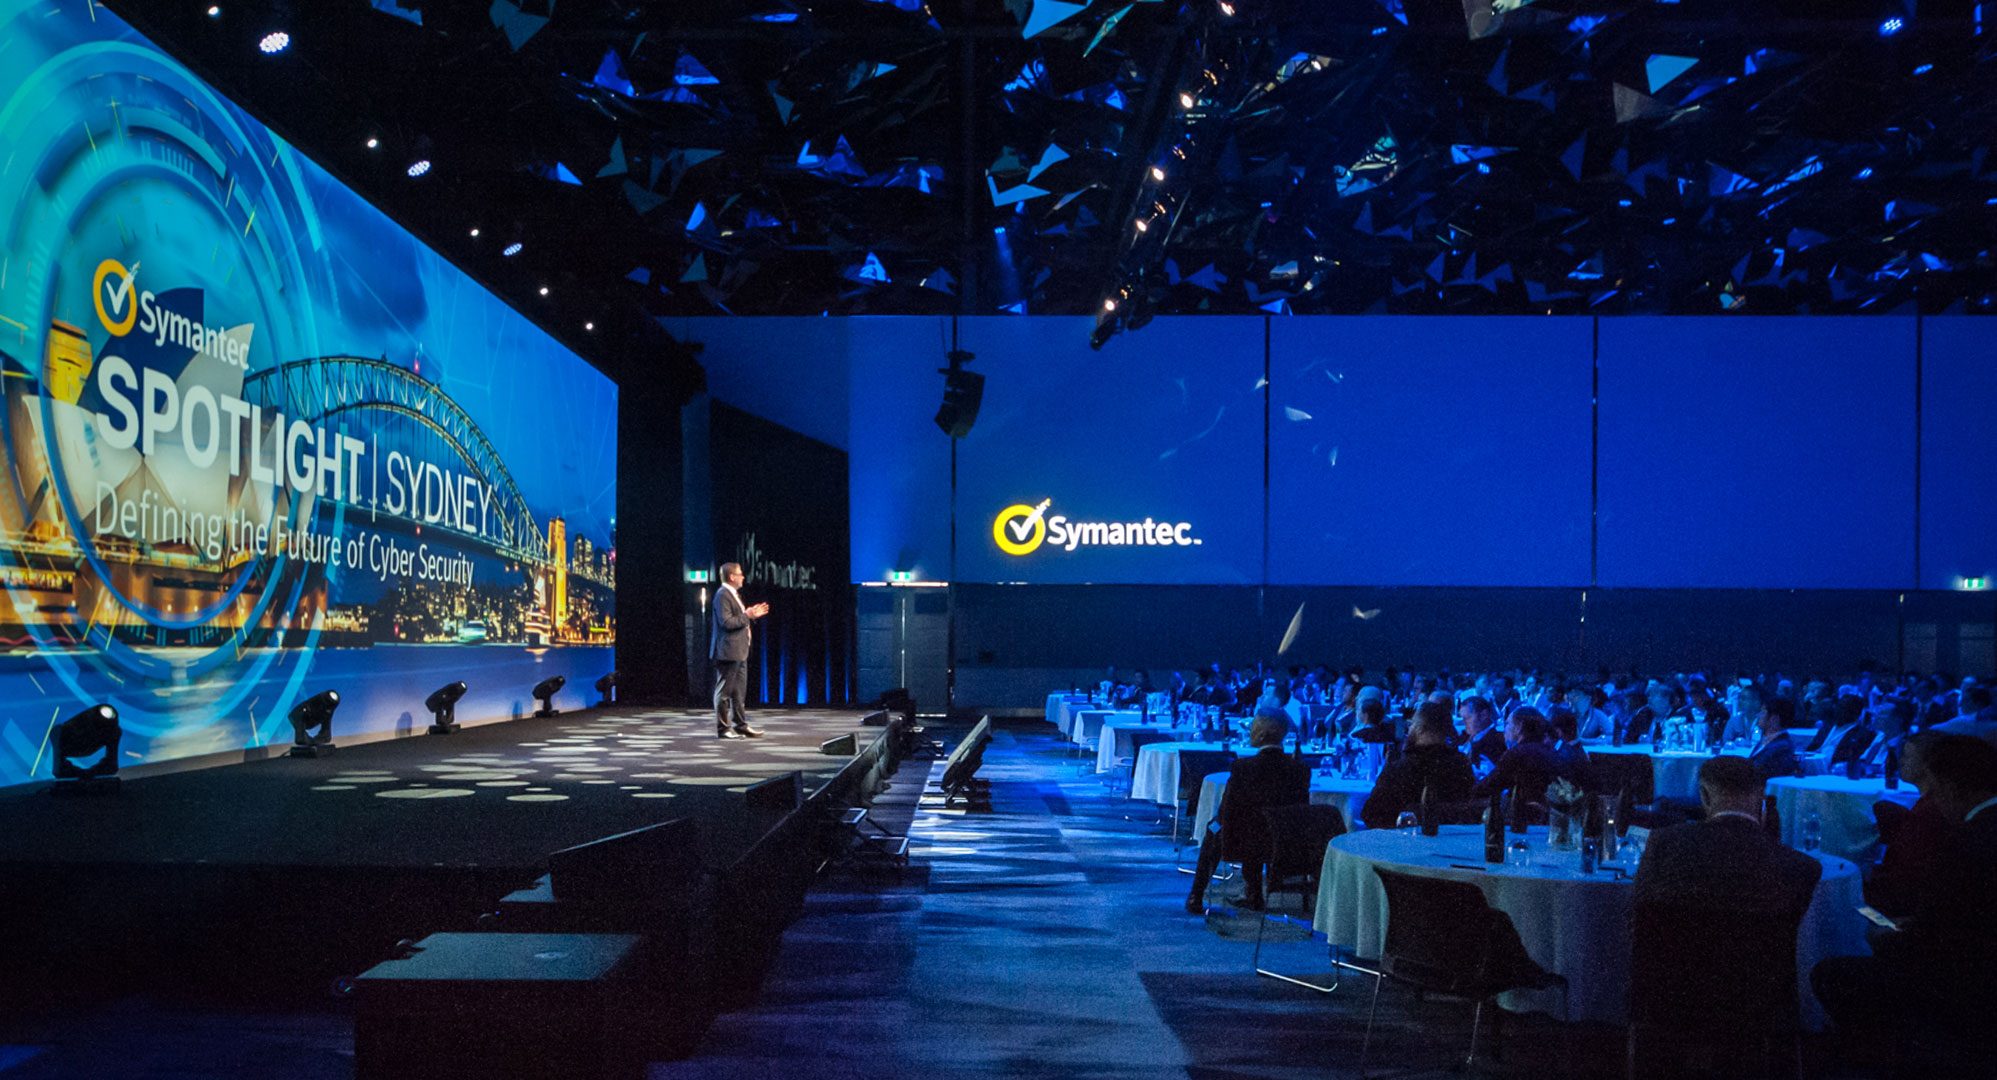 Symantec Spotlight